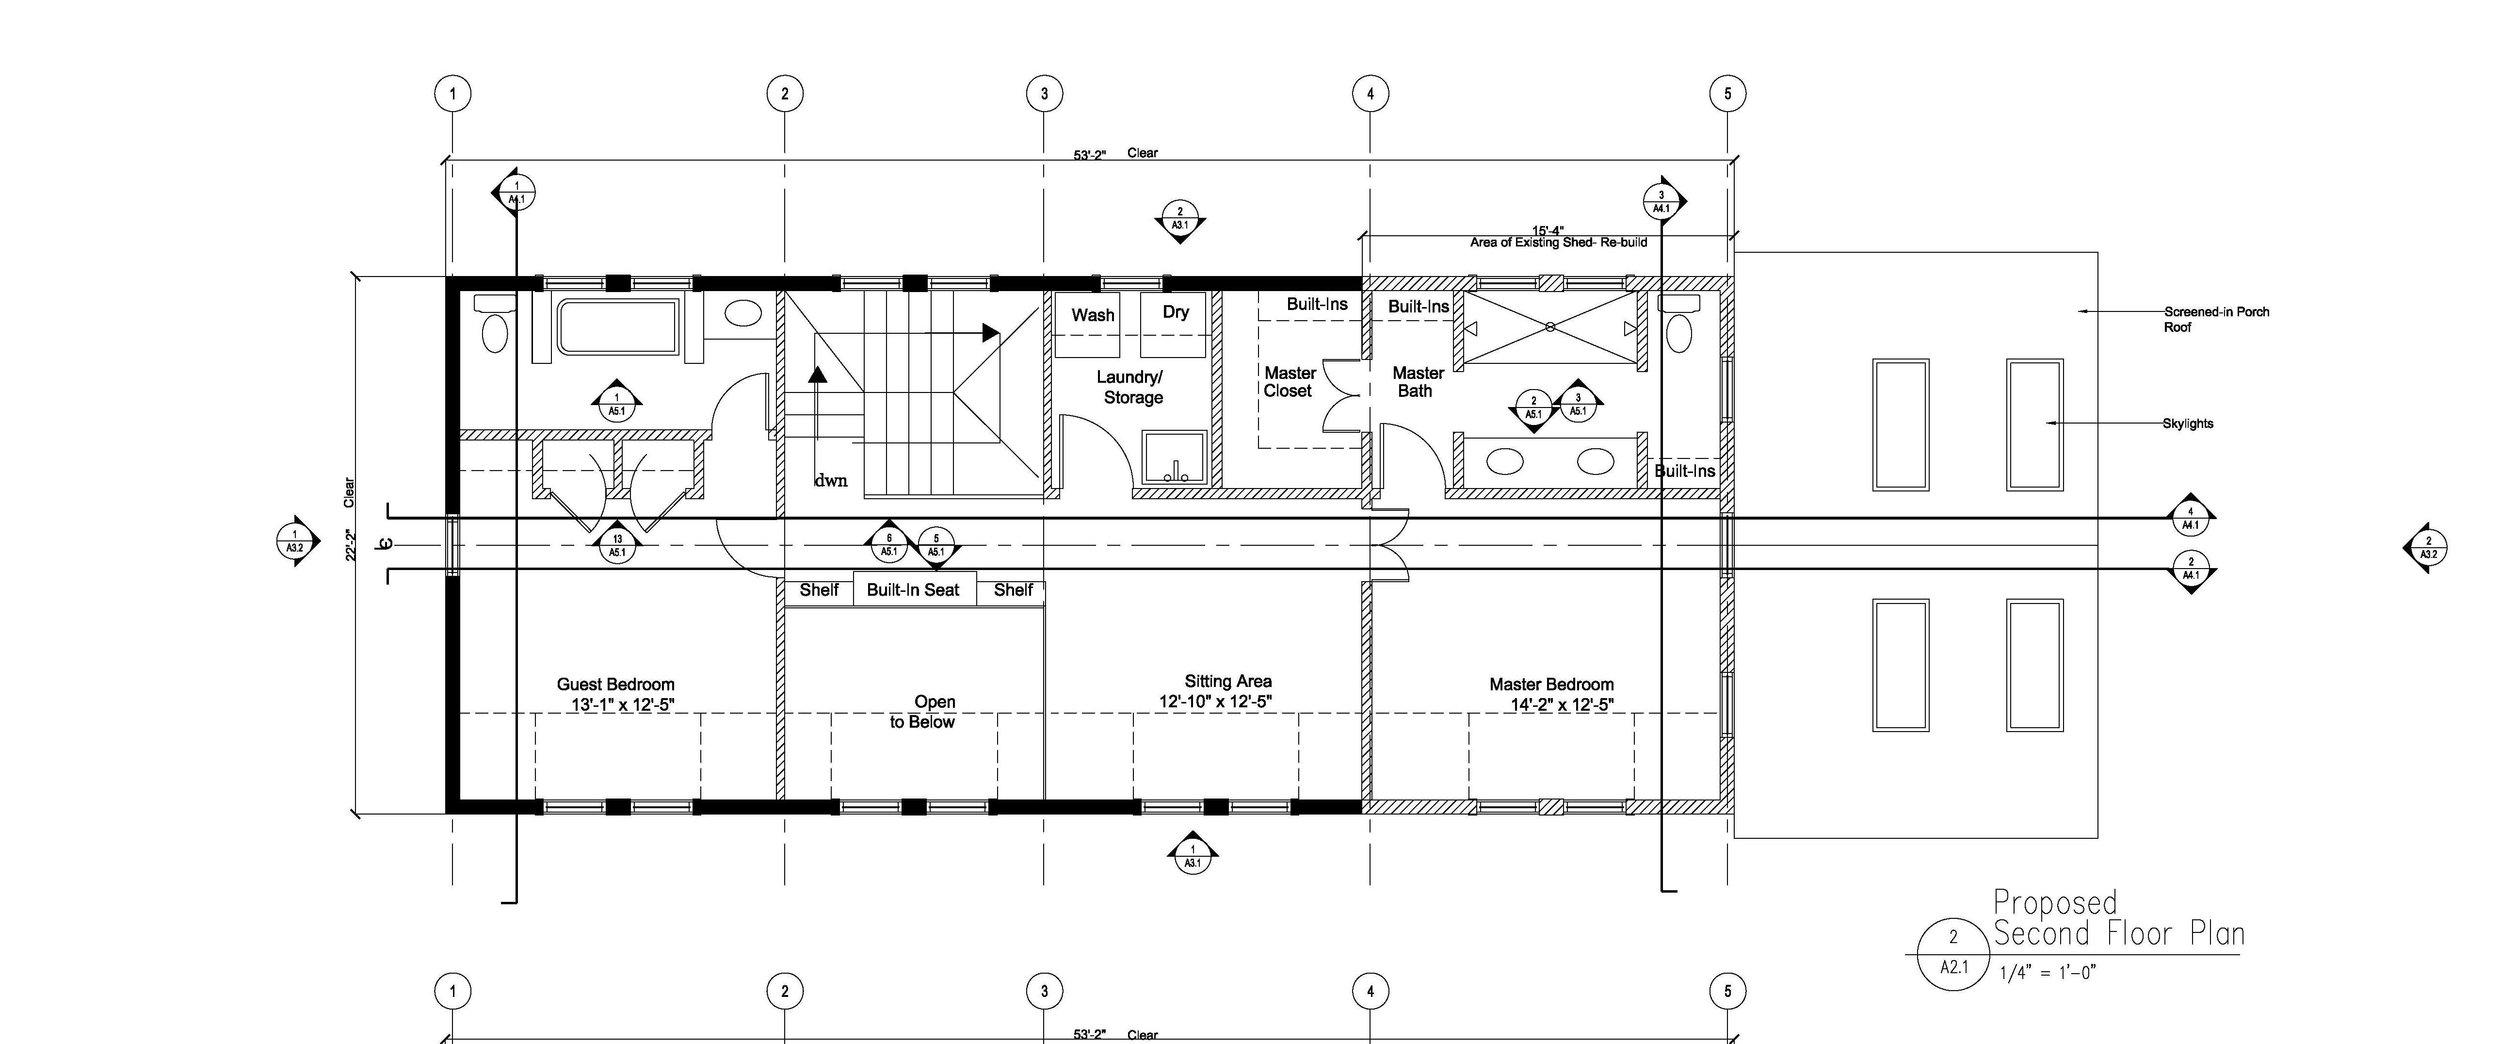 Proposed Second Floor Plan.jpg